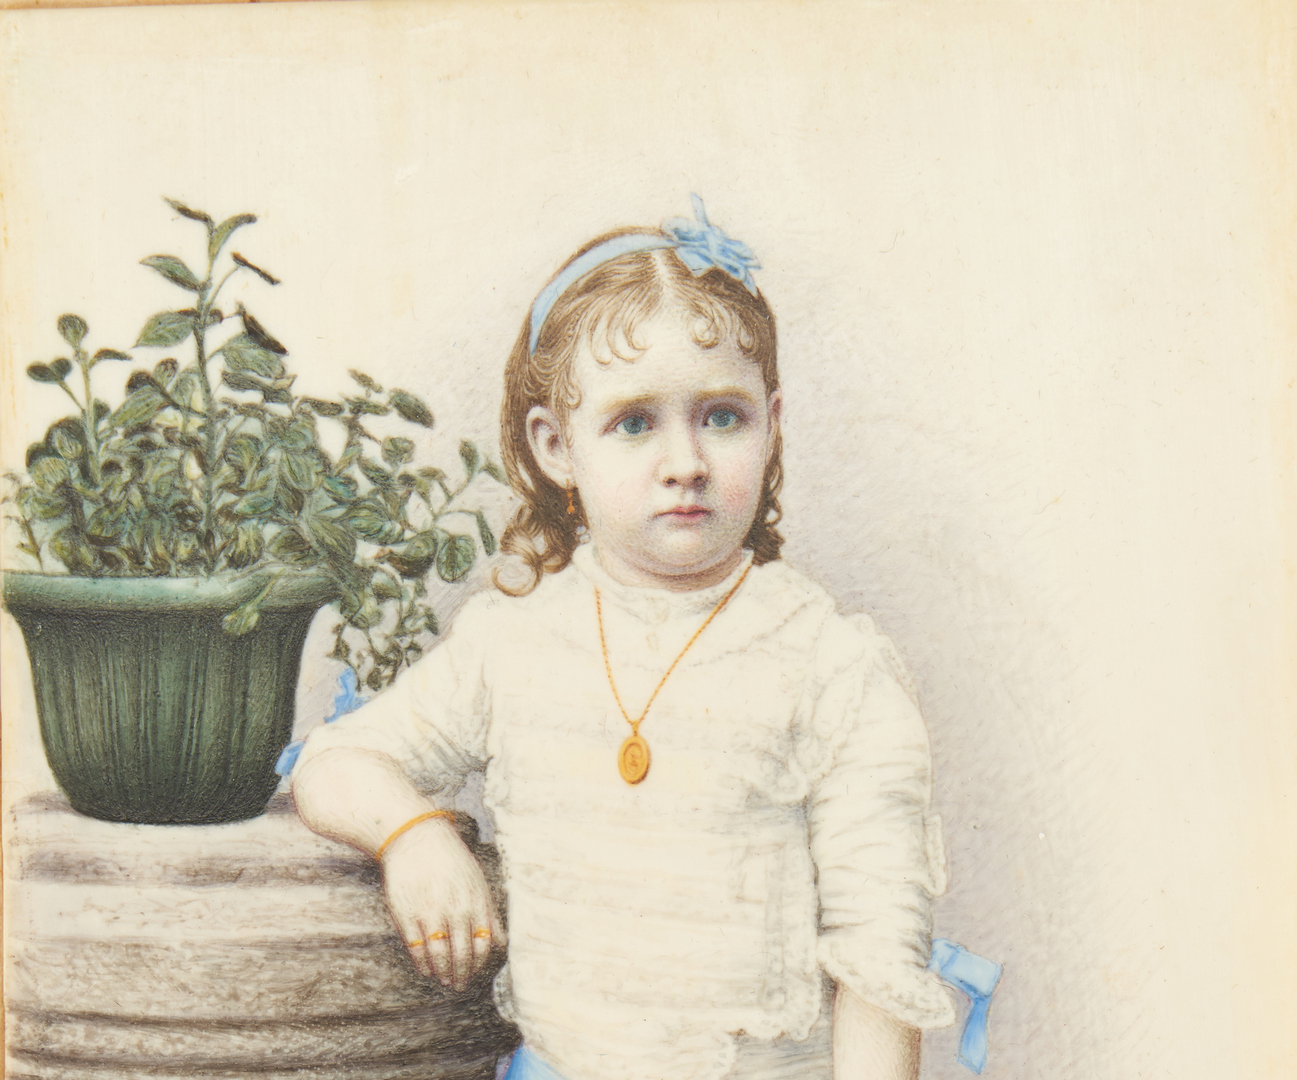 Lot 1: Yeu-Qua Portrait Miniature of Kate Freeman Clark